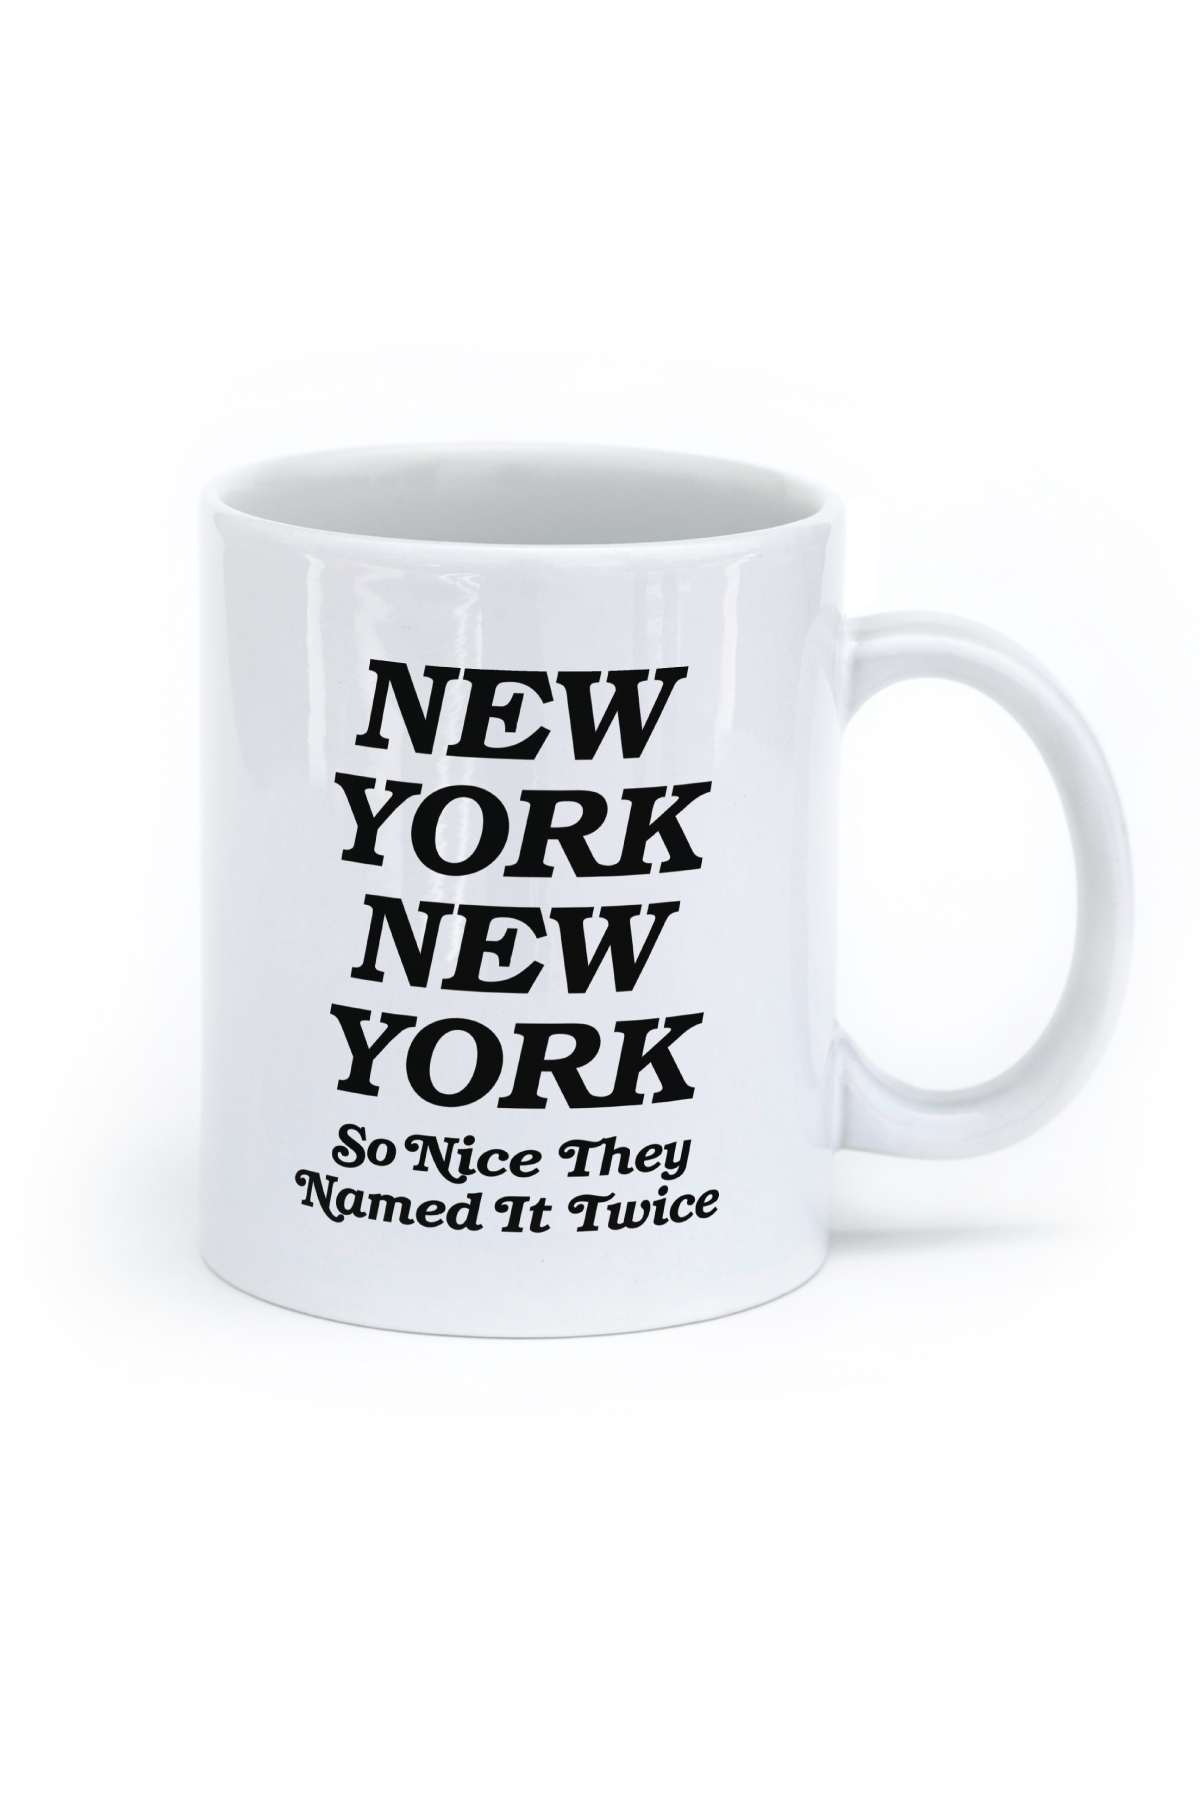 Nyc sticker ny. Mug clipart coffee bagel